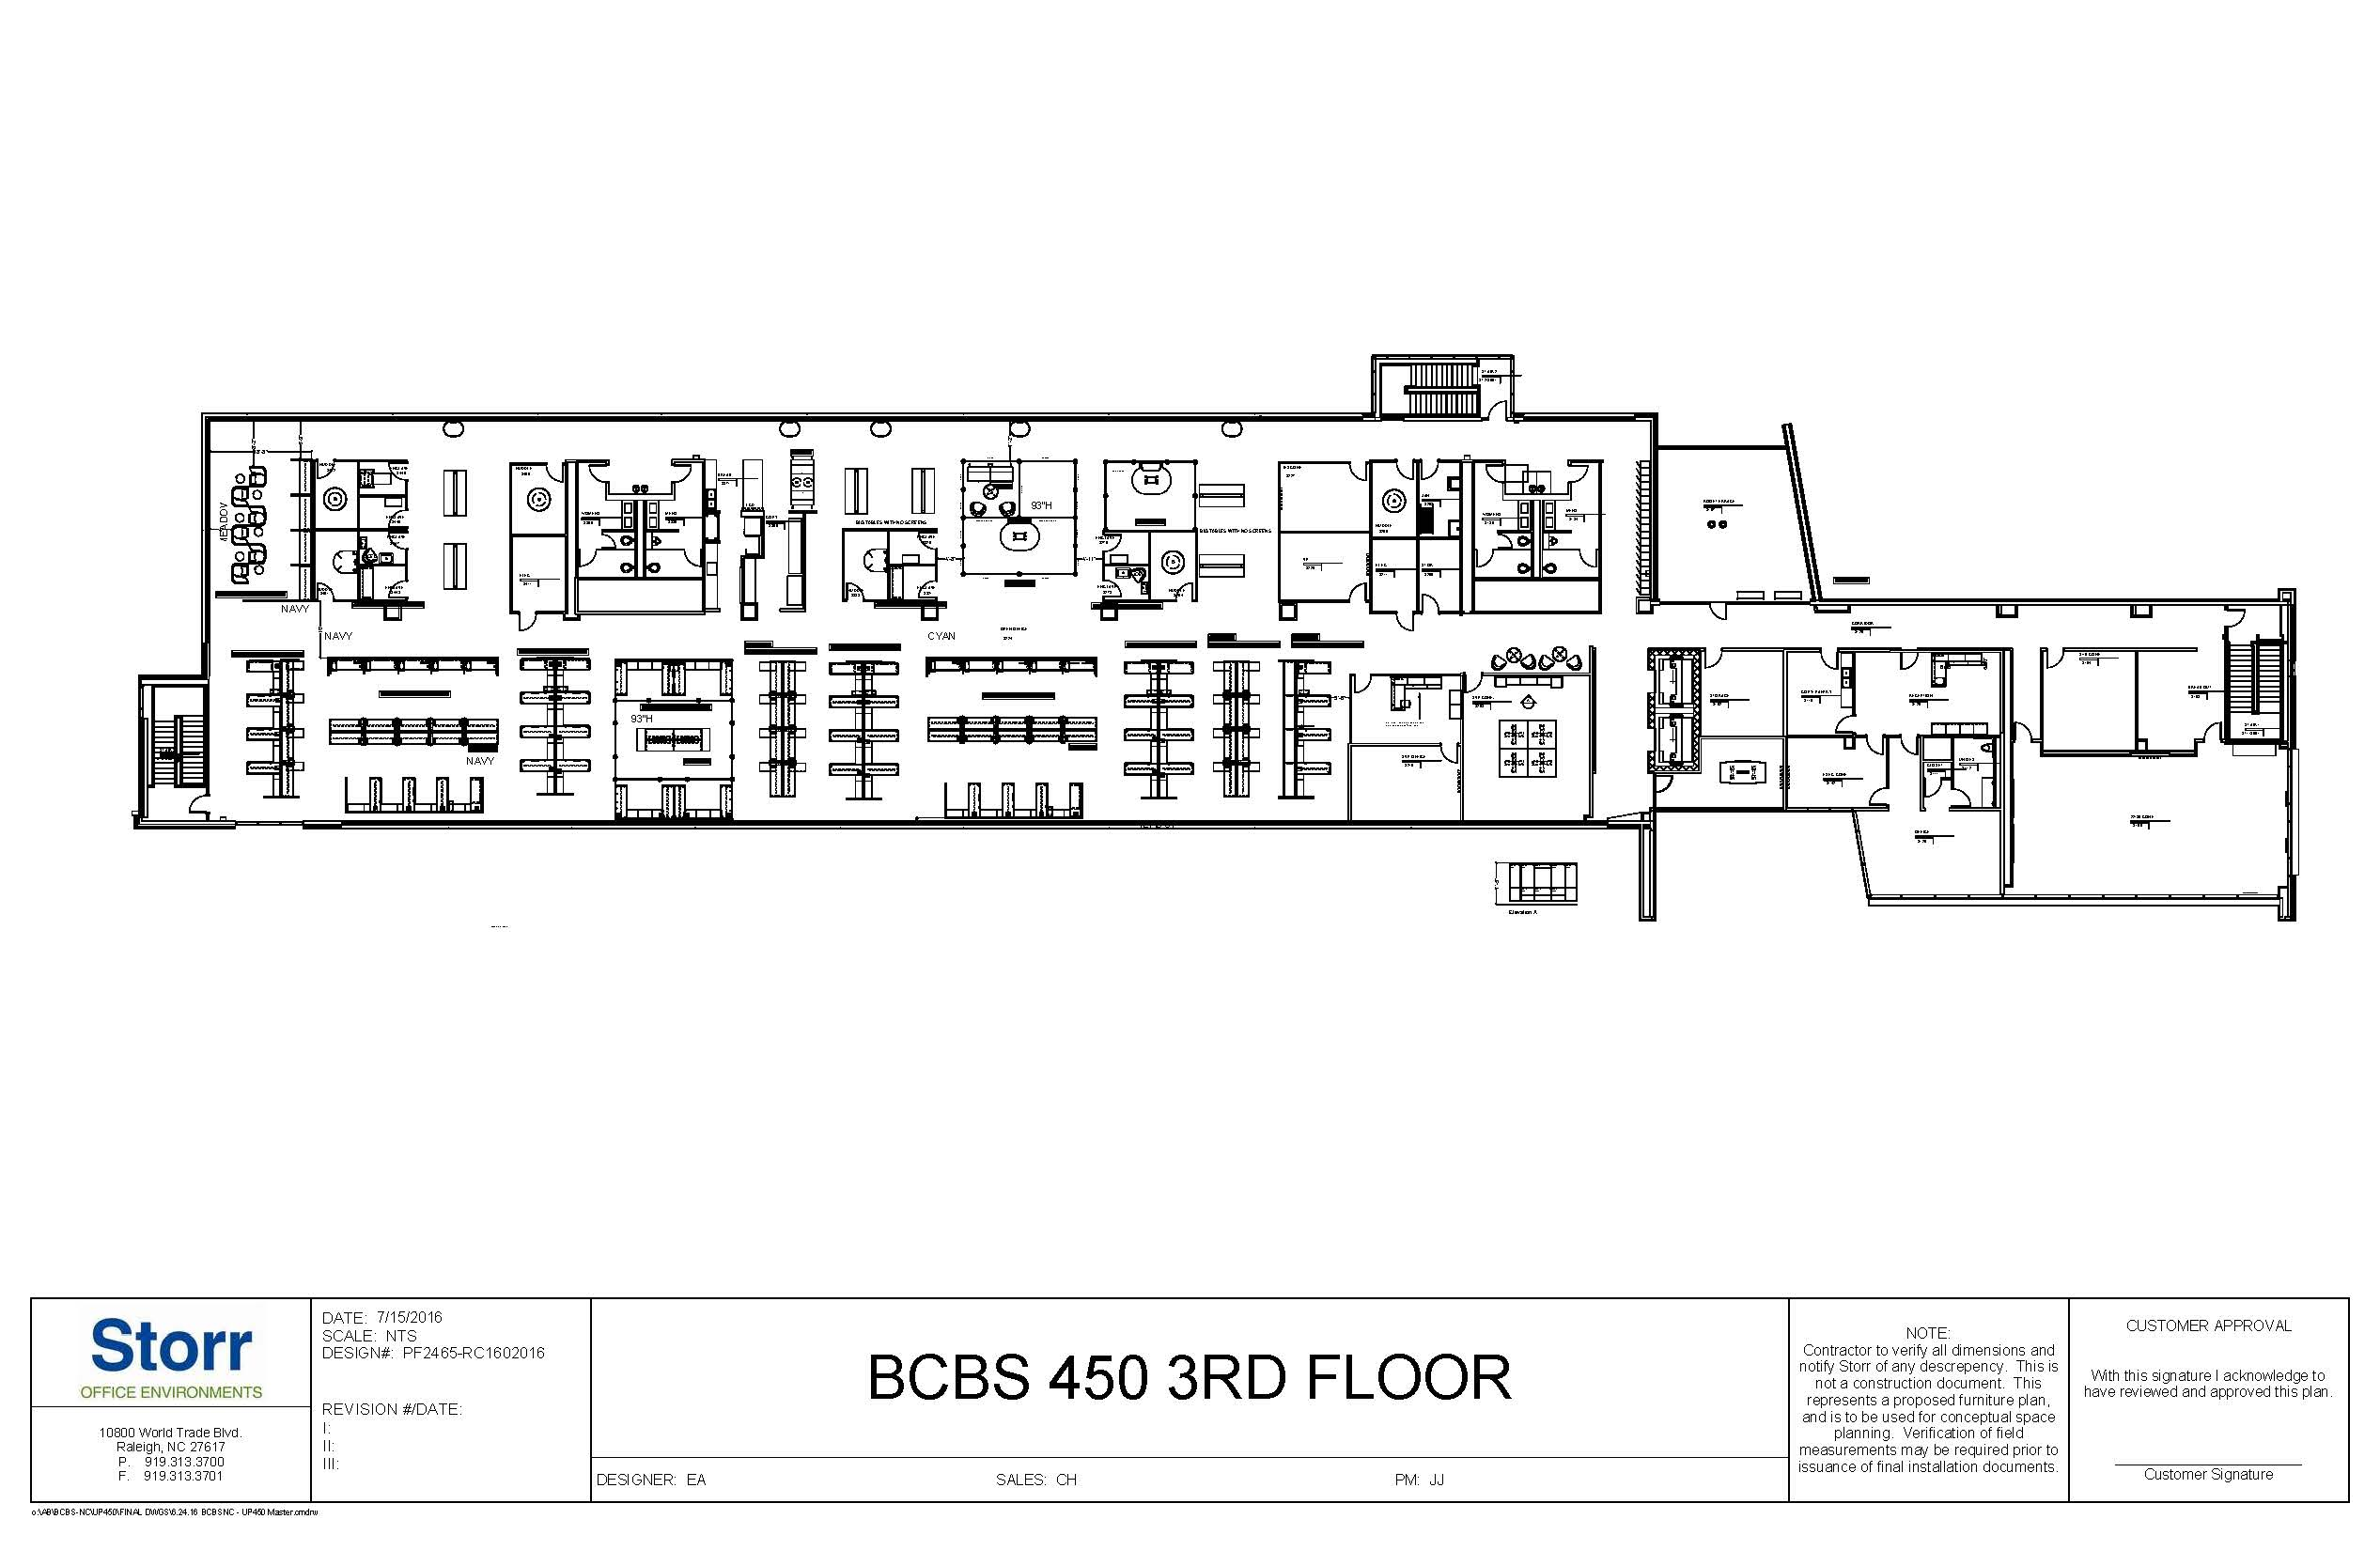 BLDG 450 3RD FLR OVERALL PLAN